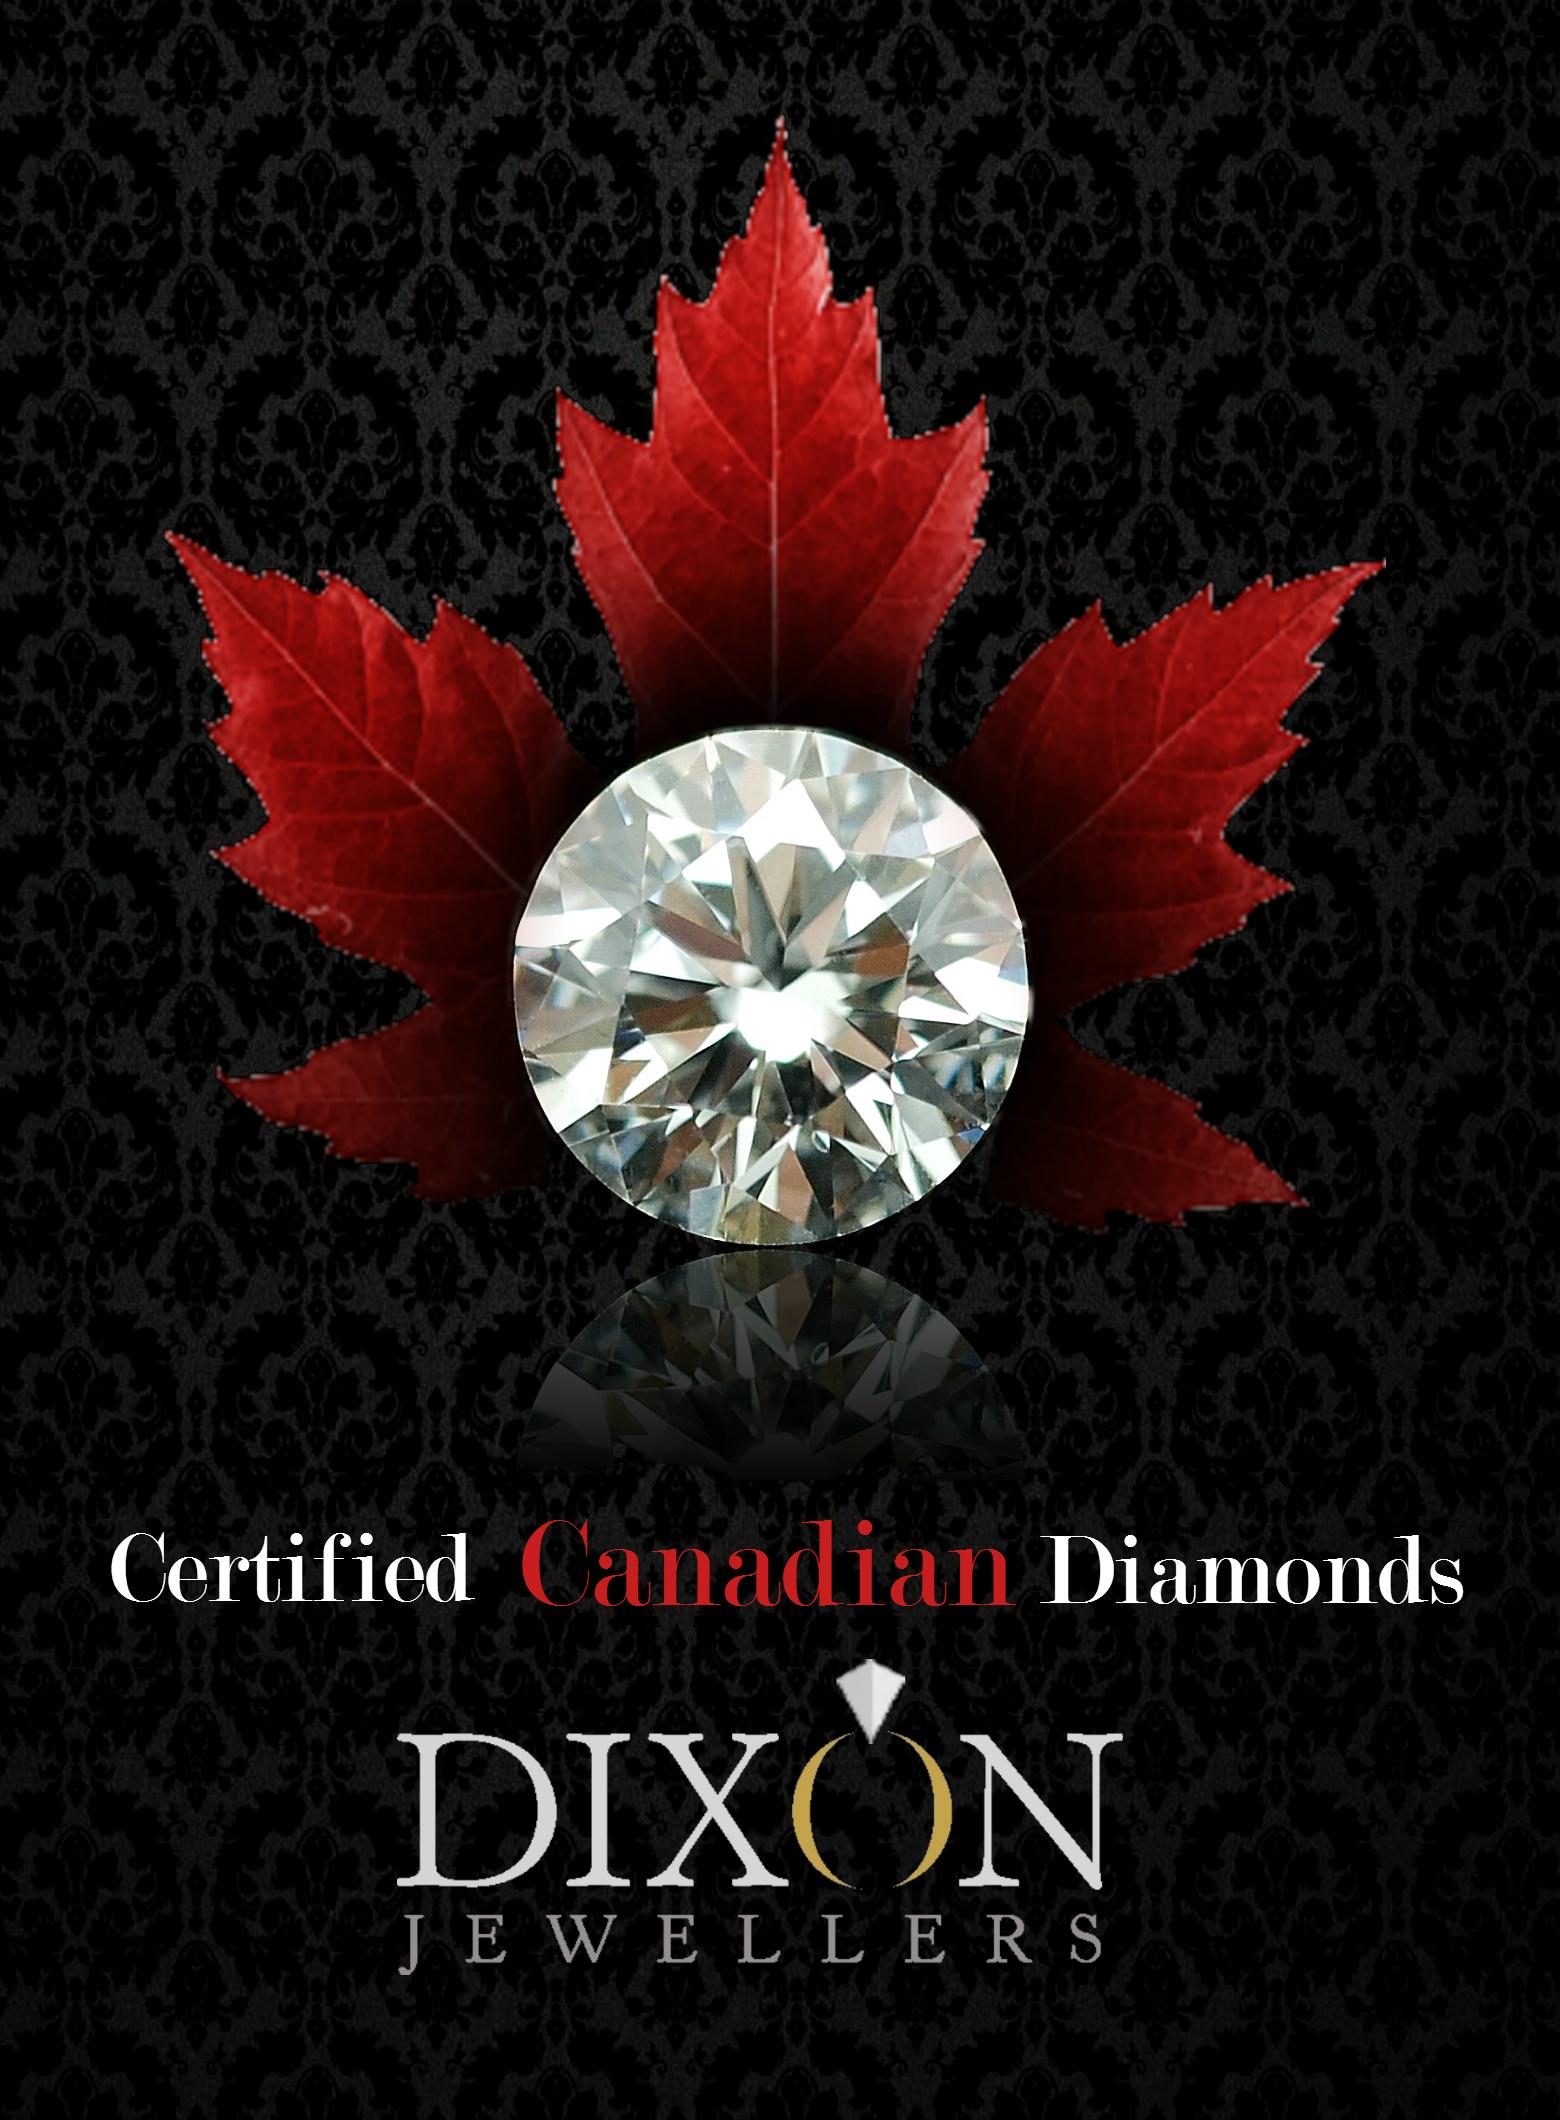 Certified Canadian Diamonds